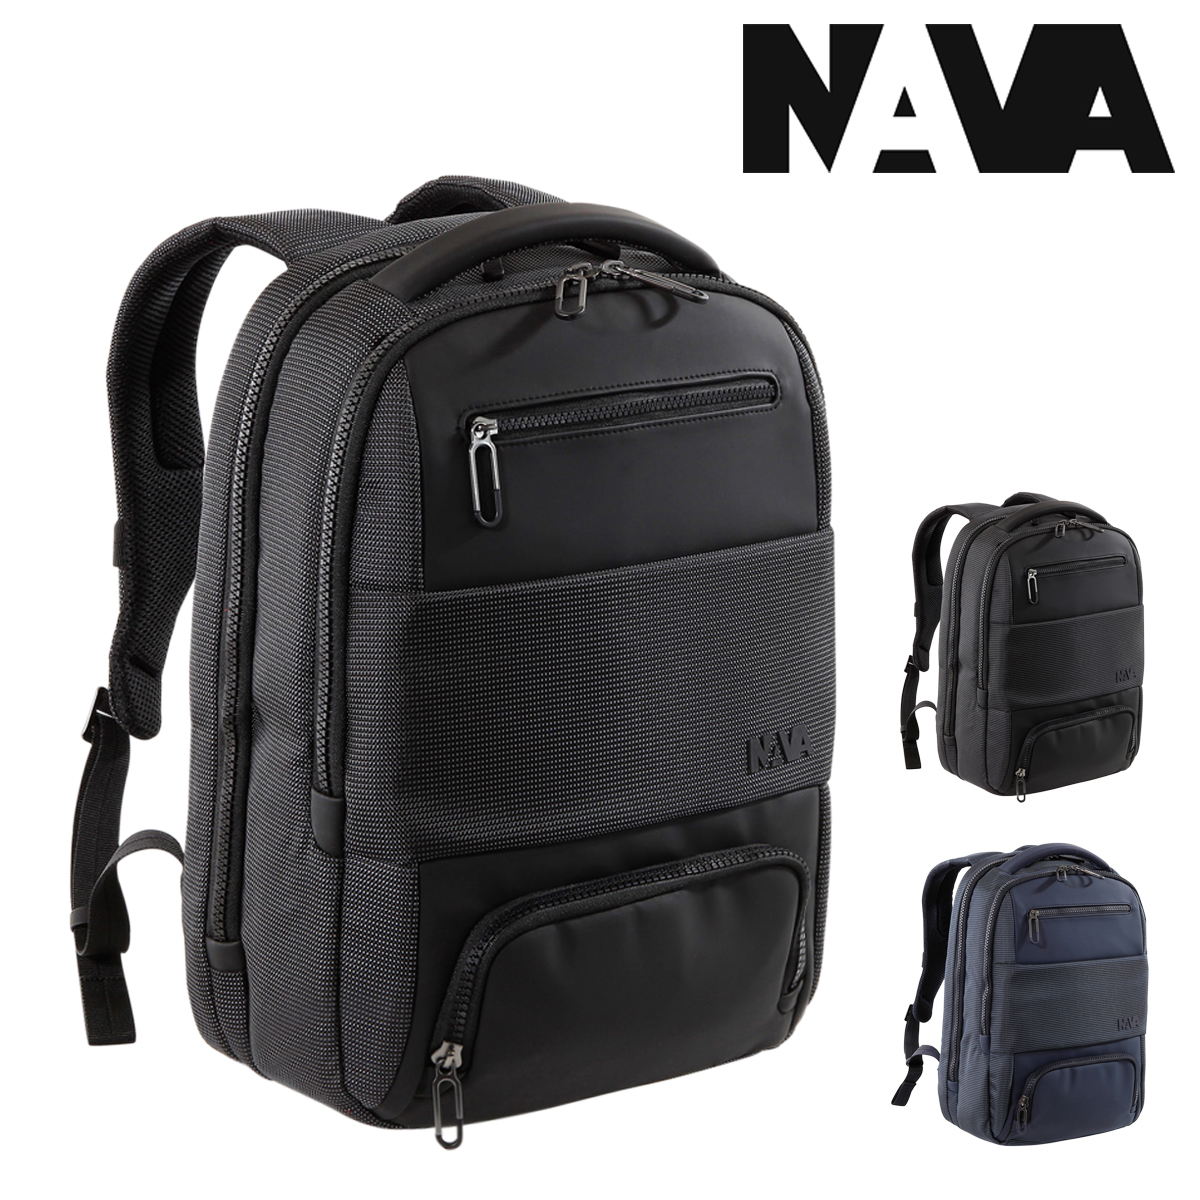 NAVA design リュック ゲート メンズ GT070 ナヴァデザイン GATE | リュックサック バックパック デイパック ビジネスバッグ キャリーオン PCケース 15インチ[PO10][bef]